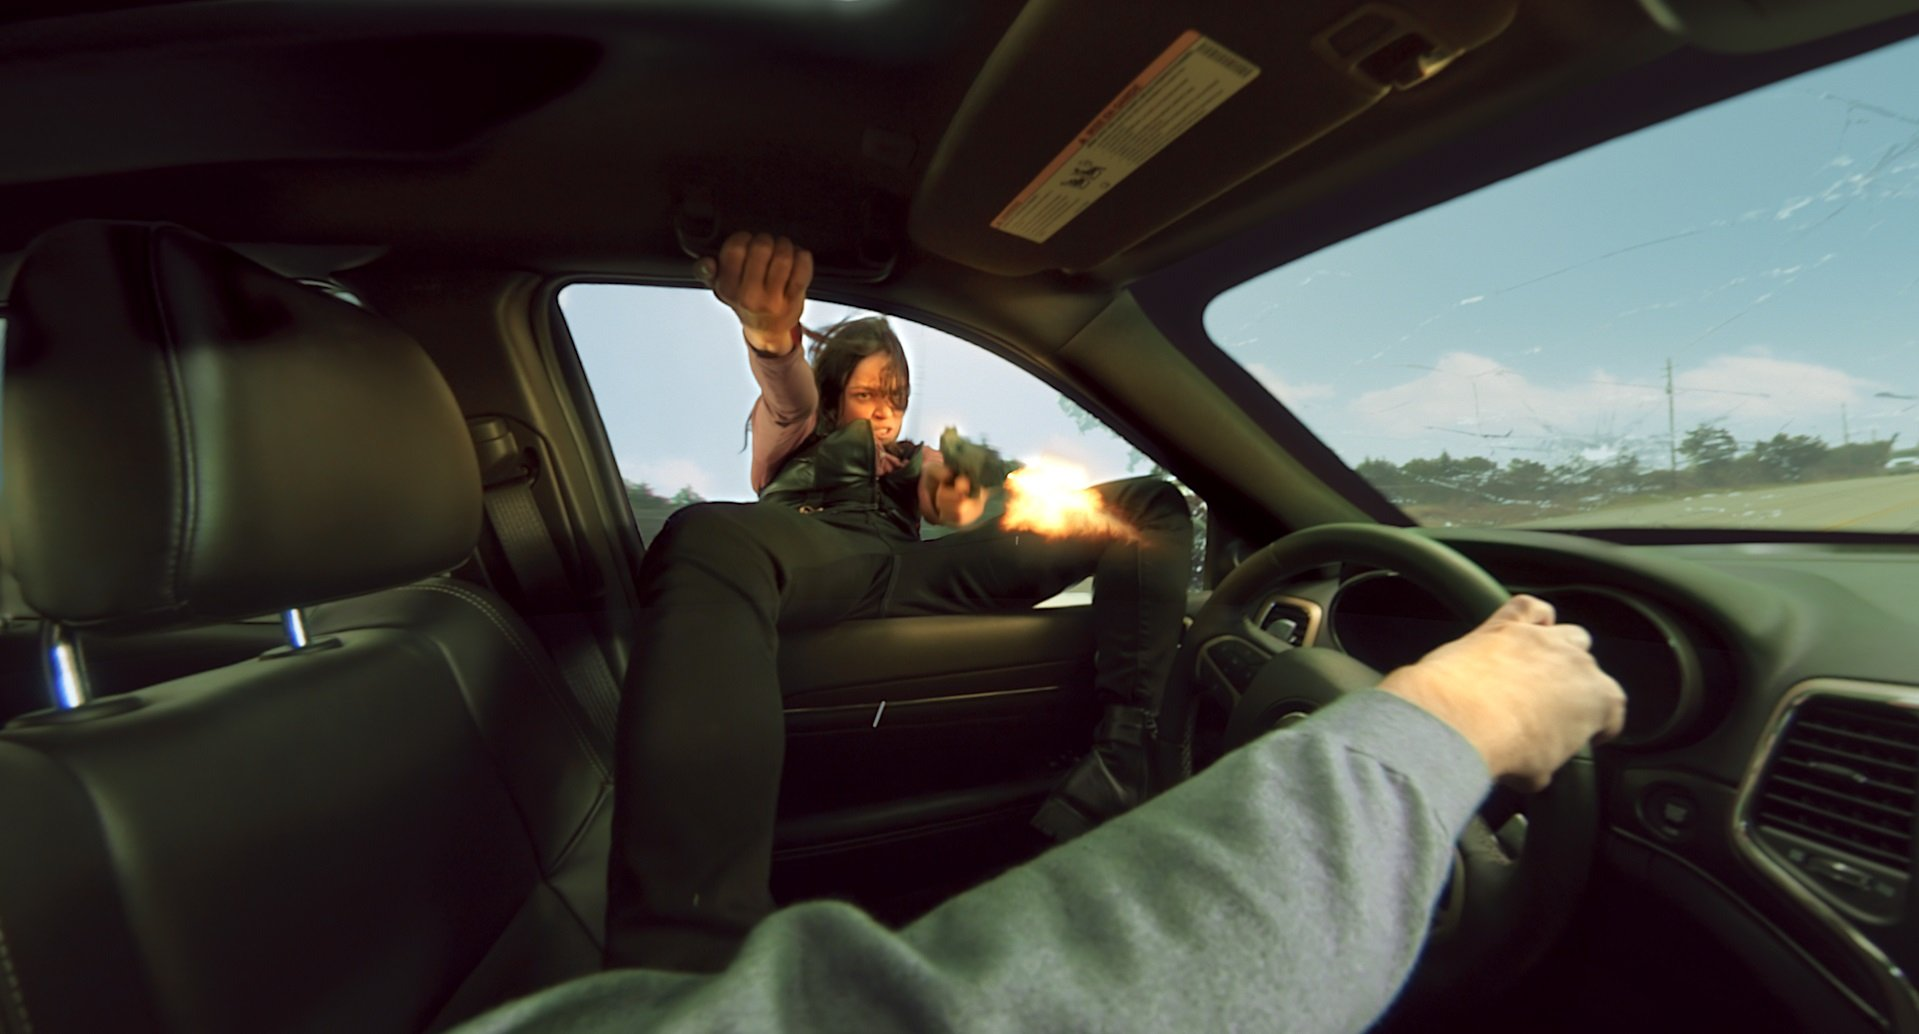 Contest: Win a copy of The Limit, Robert Rodriguez's VR film screenshot